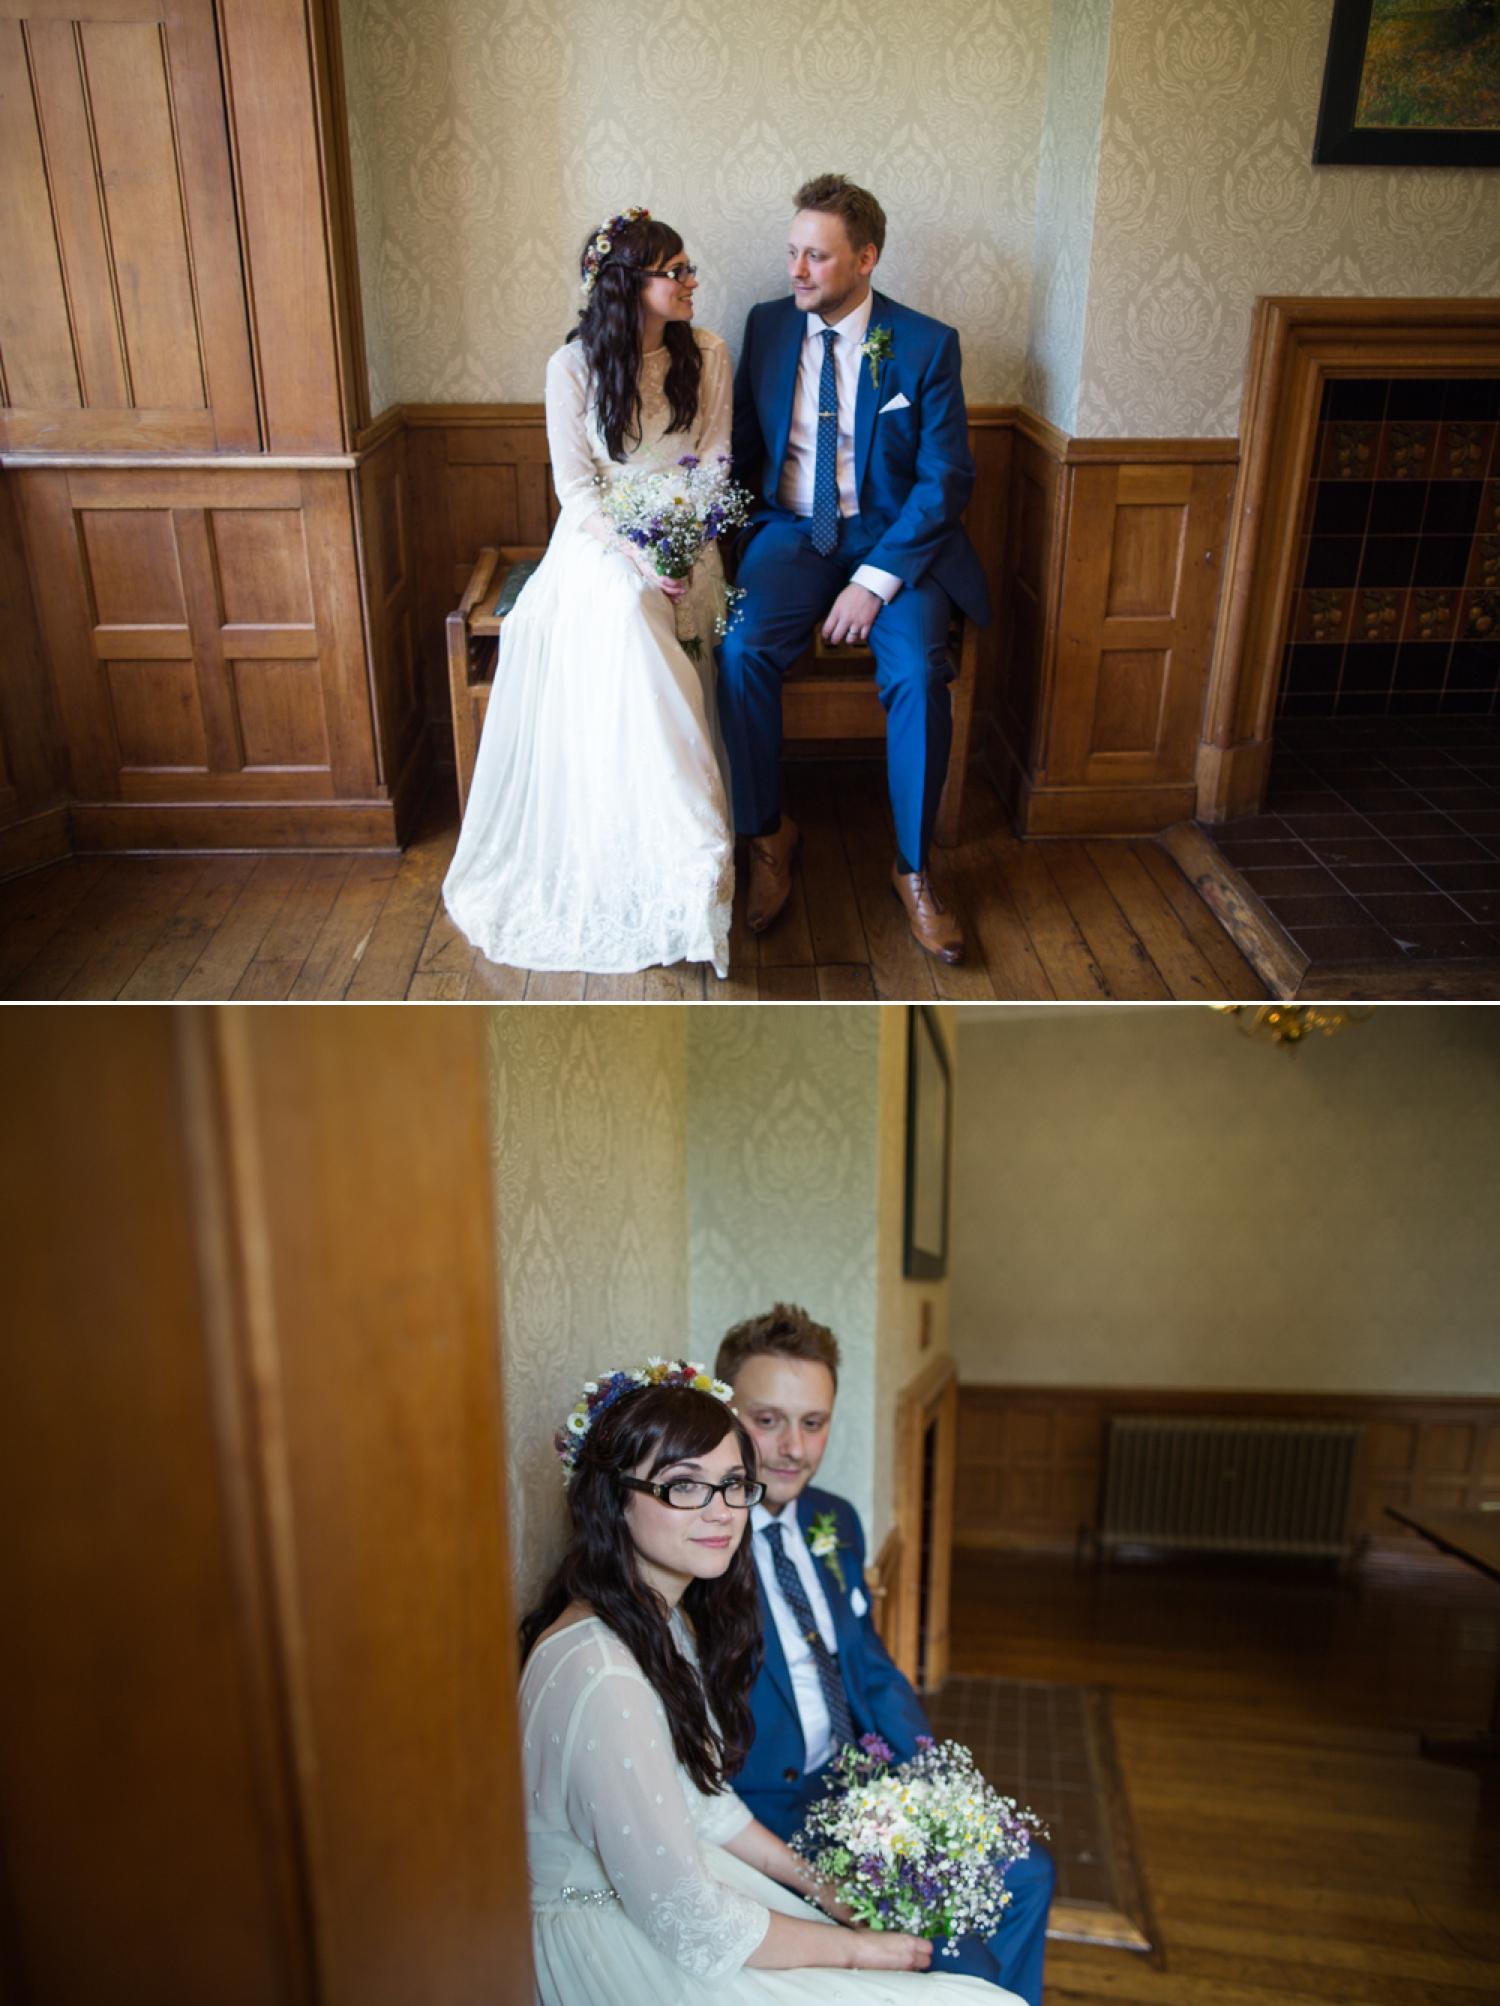 Somerset Wedding Photographer Elly & Liam_0021.jpg